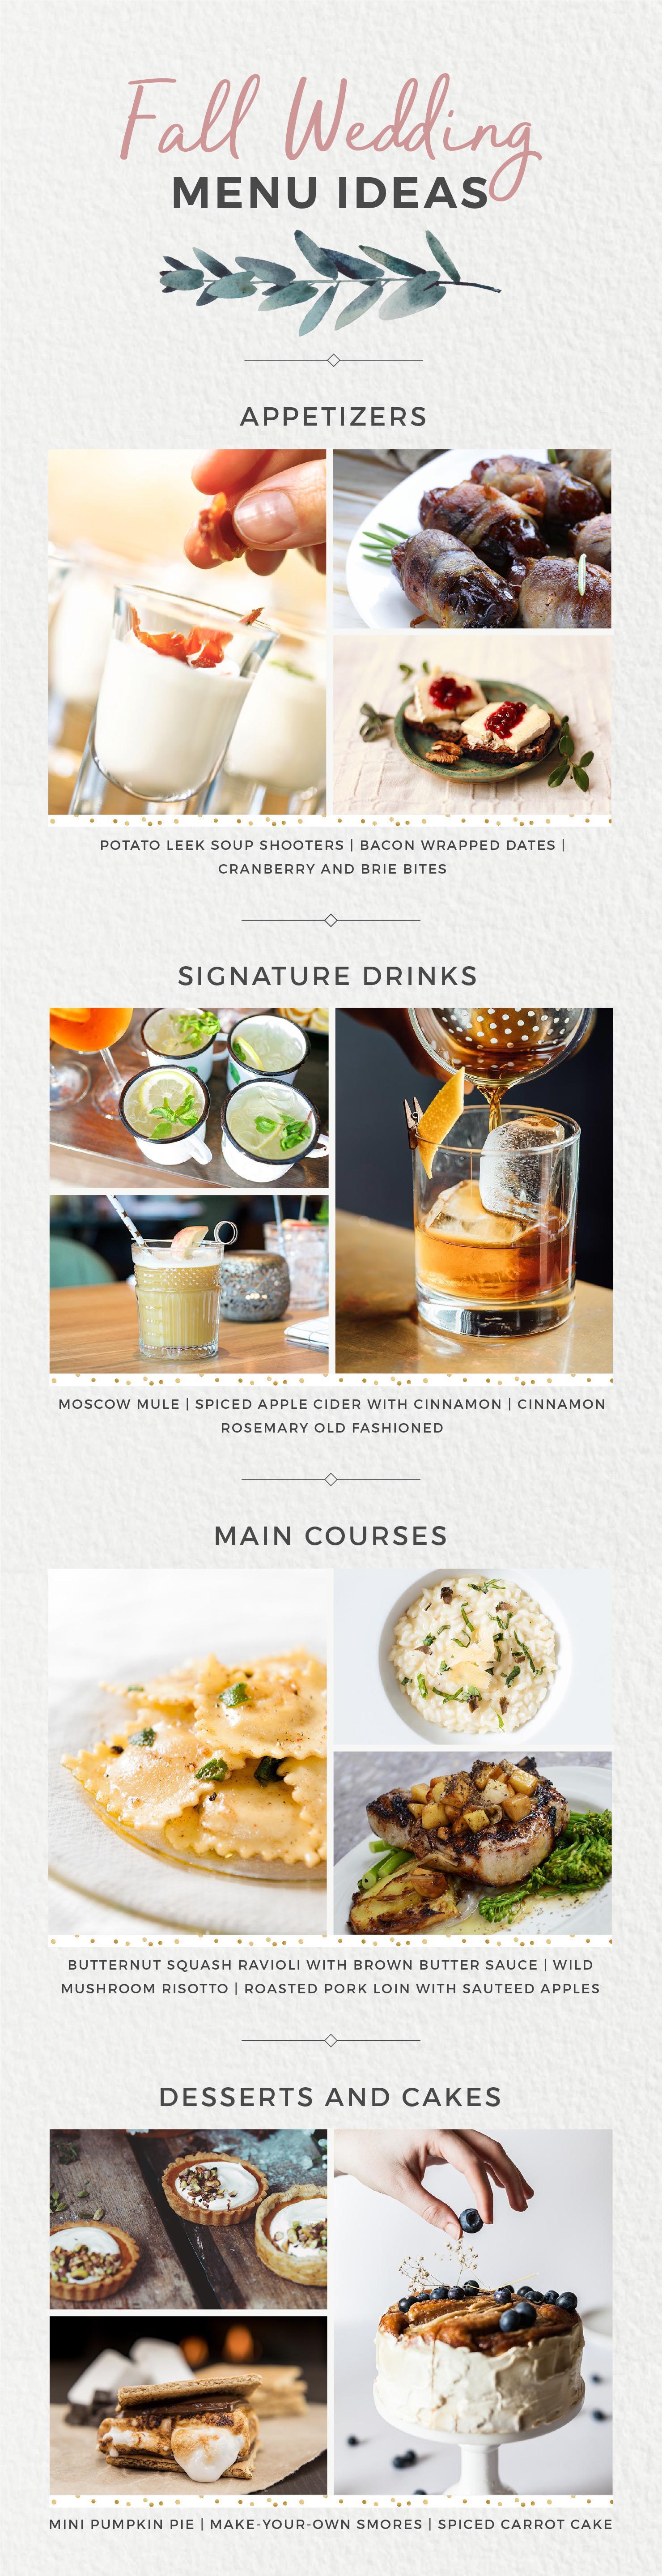 Wedding Menu Ideas for Every Season Fall Wedding Food Shutterfly Philly In Love Philadelphia Weddings